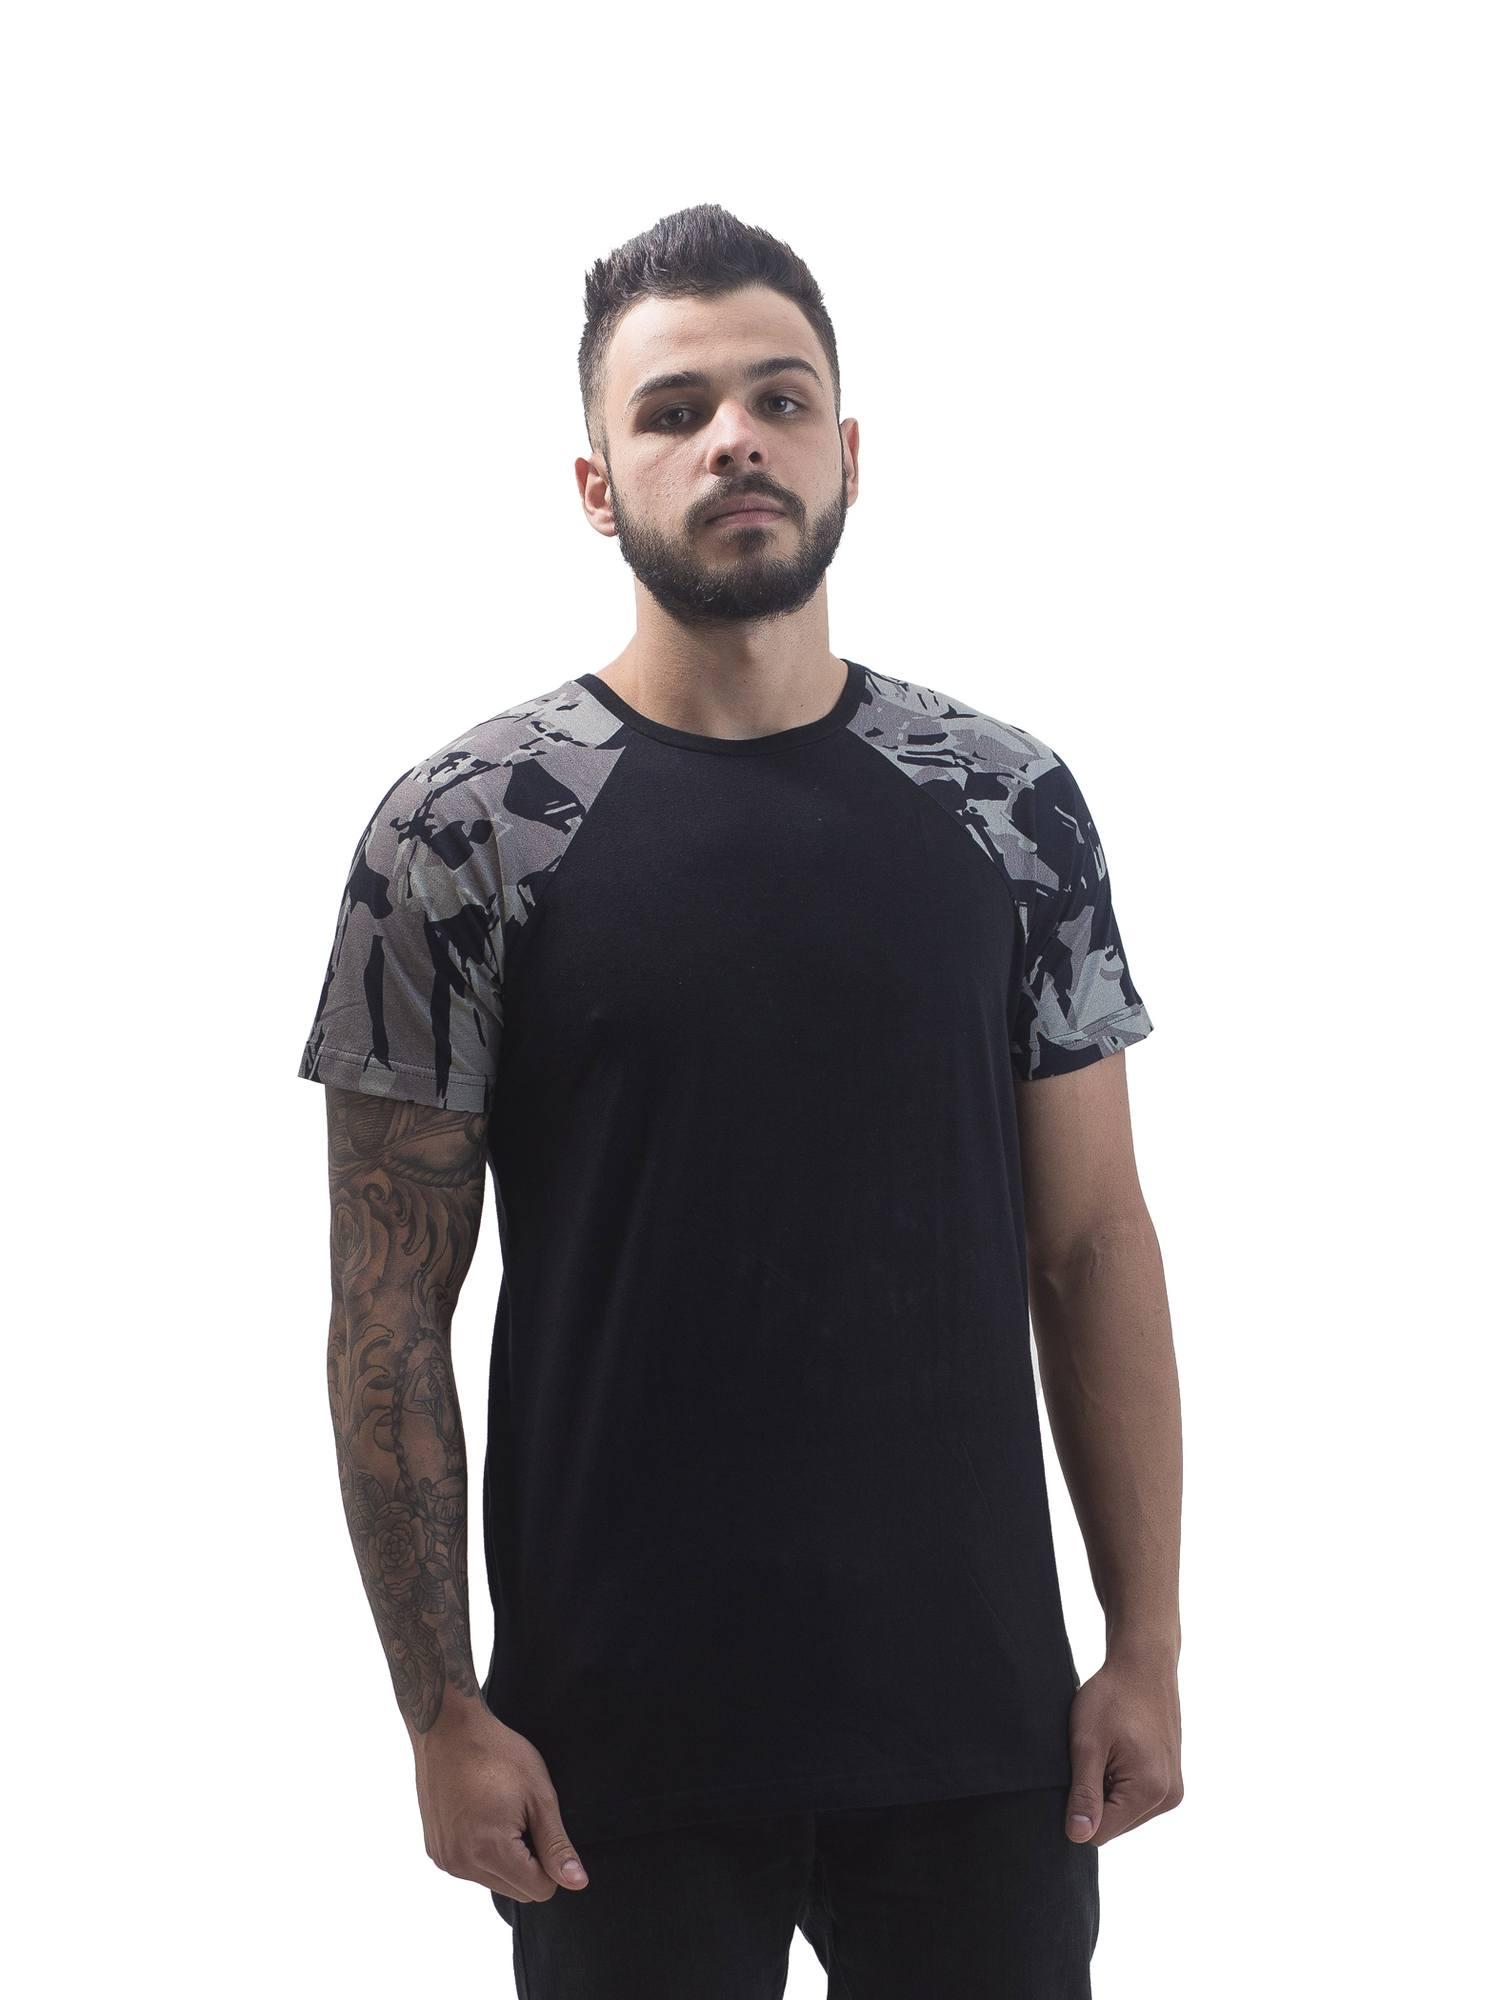 Camiseta raglan CAMO Mangas